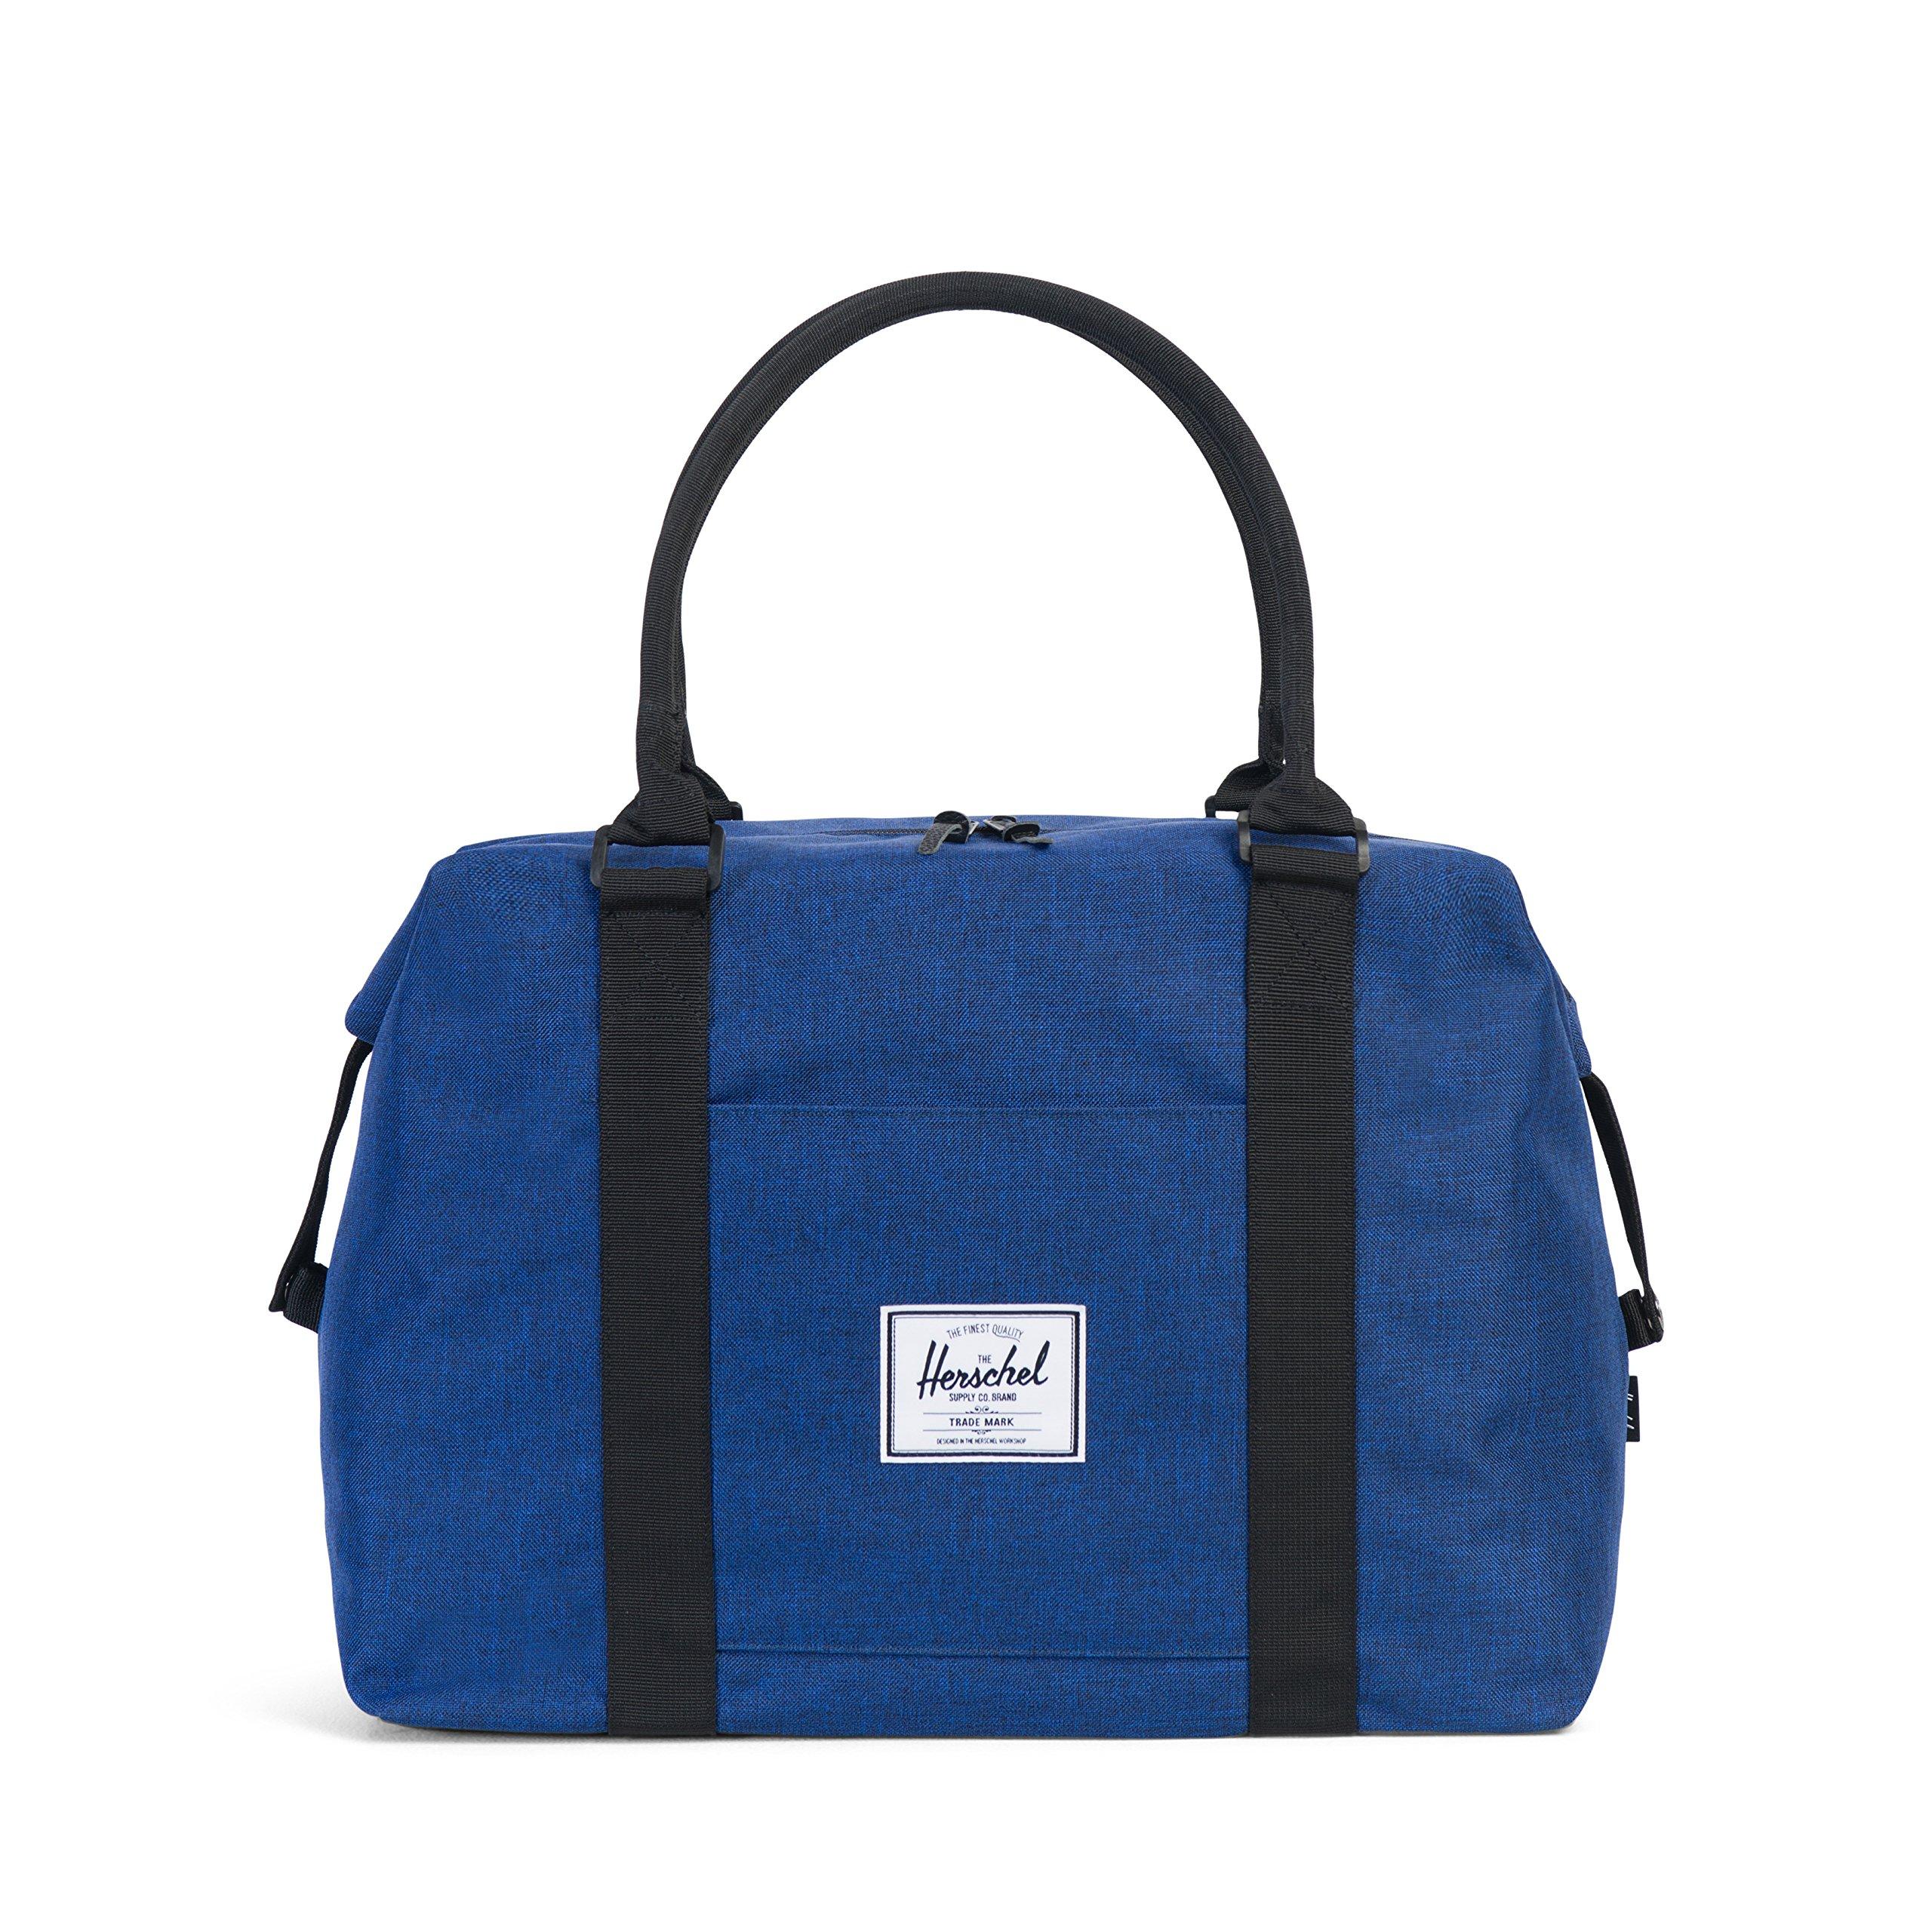 Herschel Strand Duffle Bag, Eclipse Crosshatch